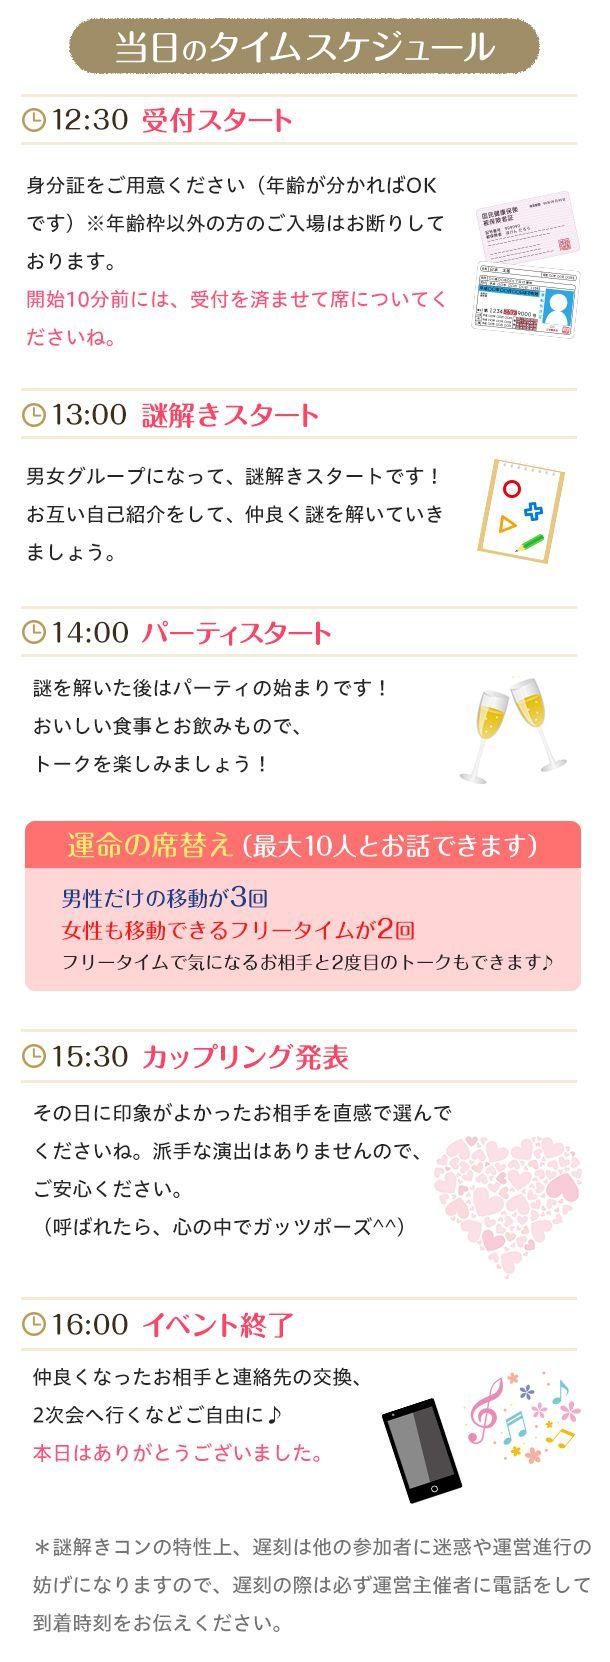 timeschedule (3)